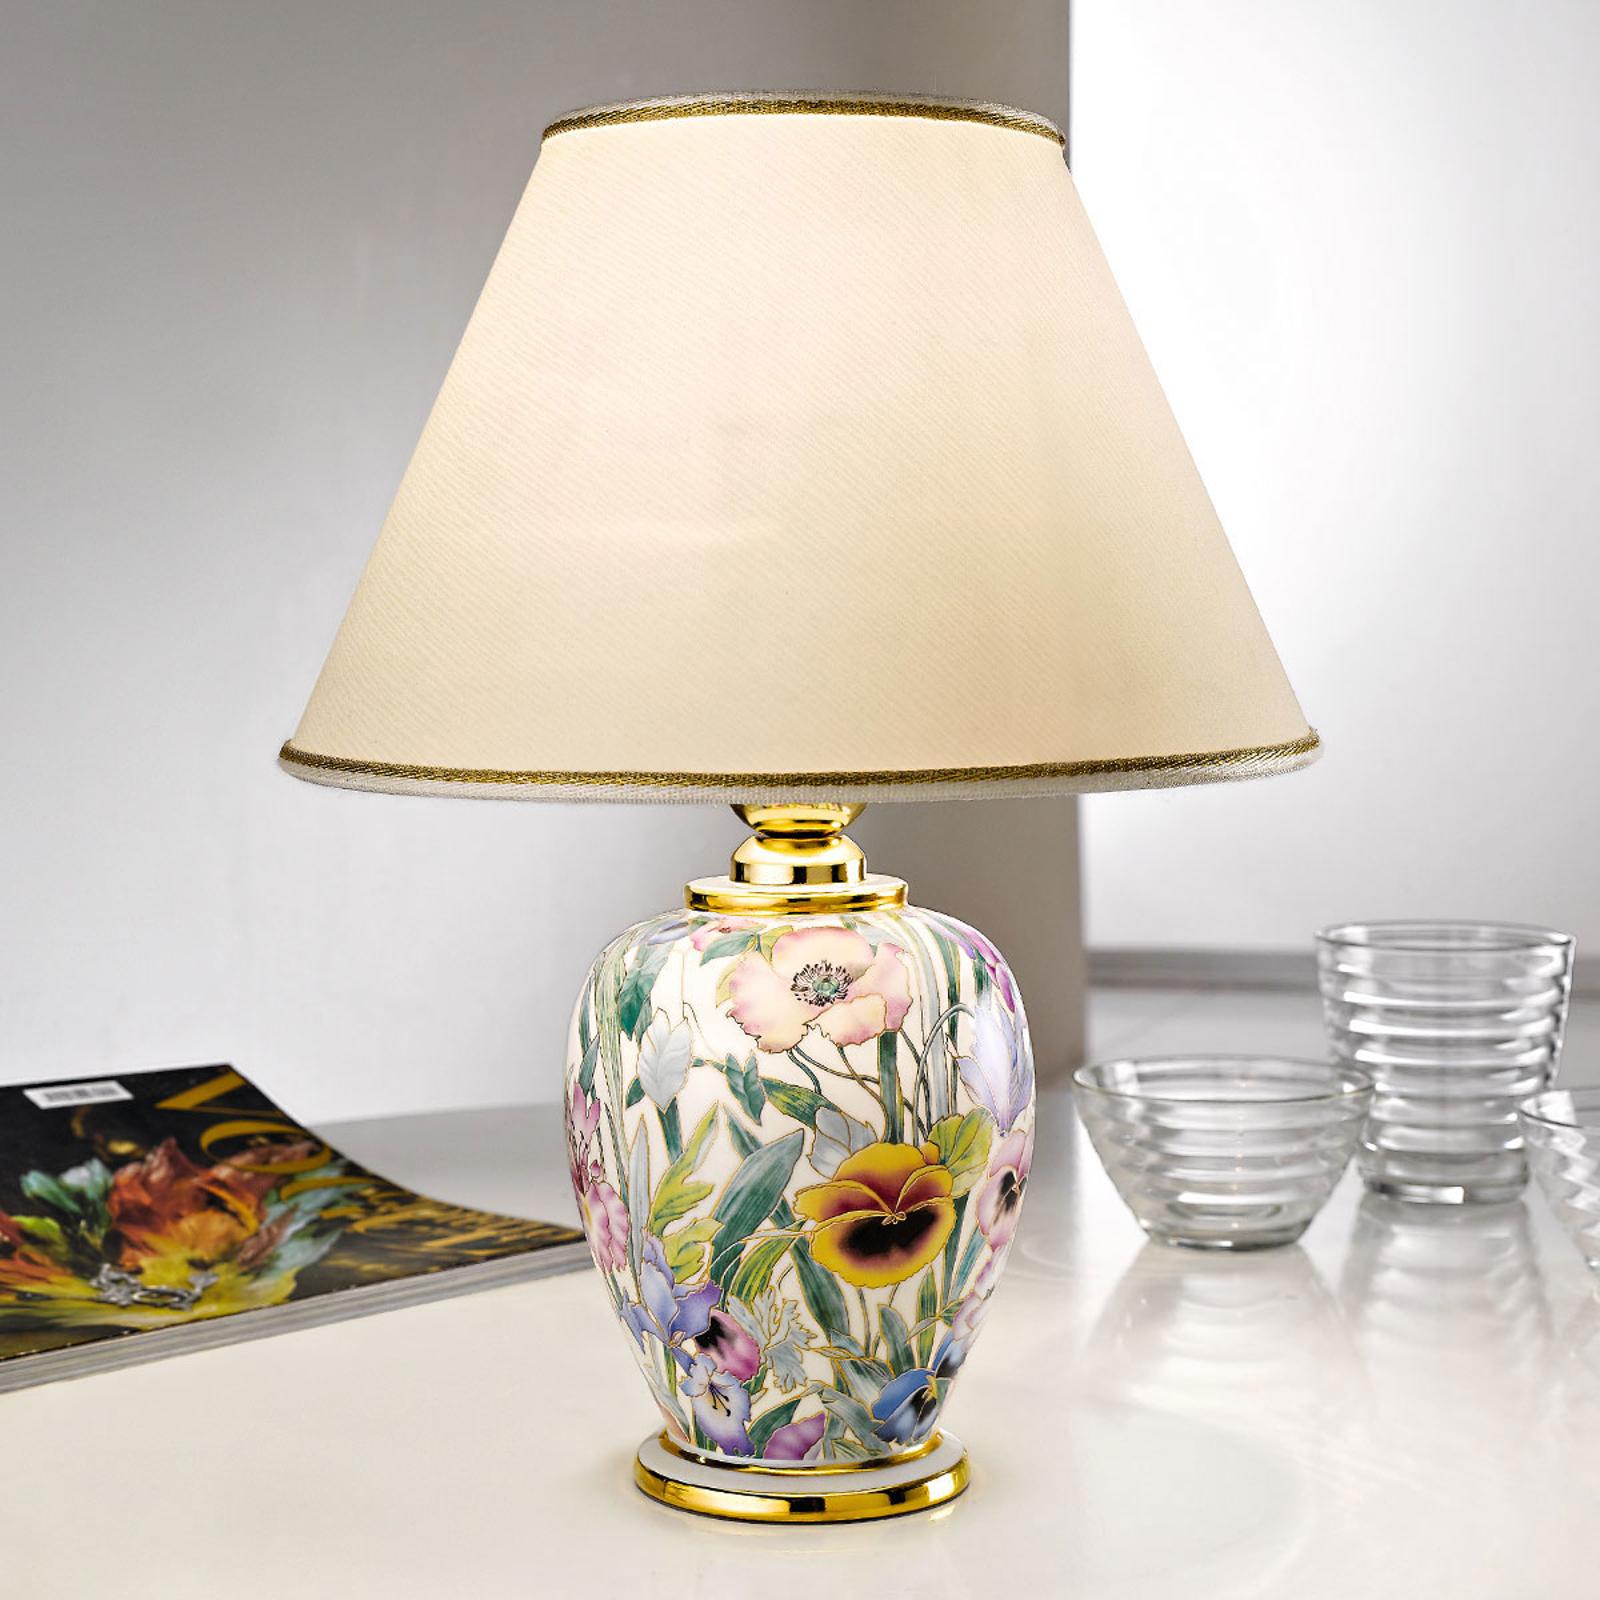 Tafellamp Giardino Panse, bloemenprint, Ø 25 cm